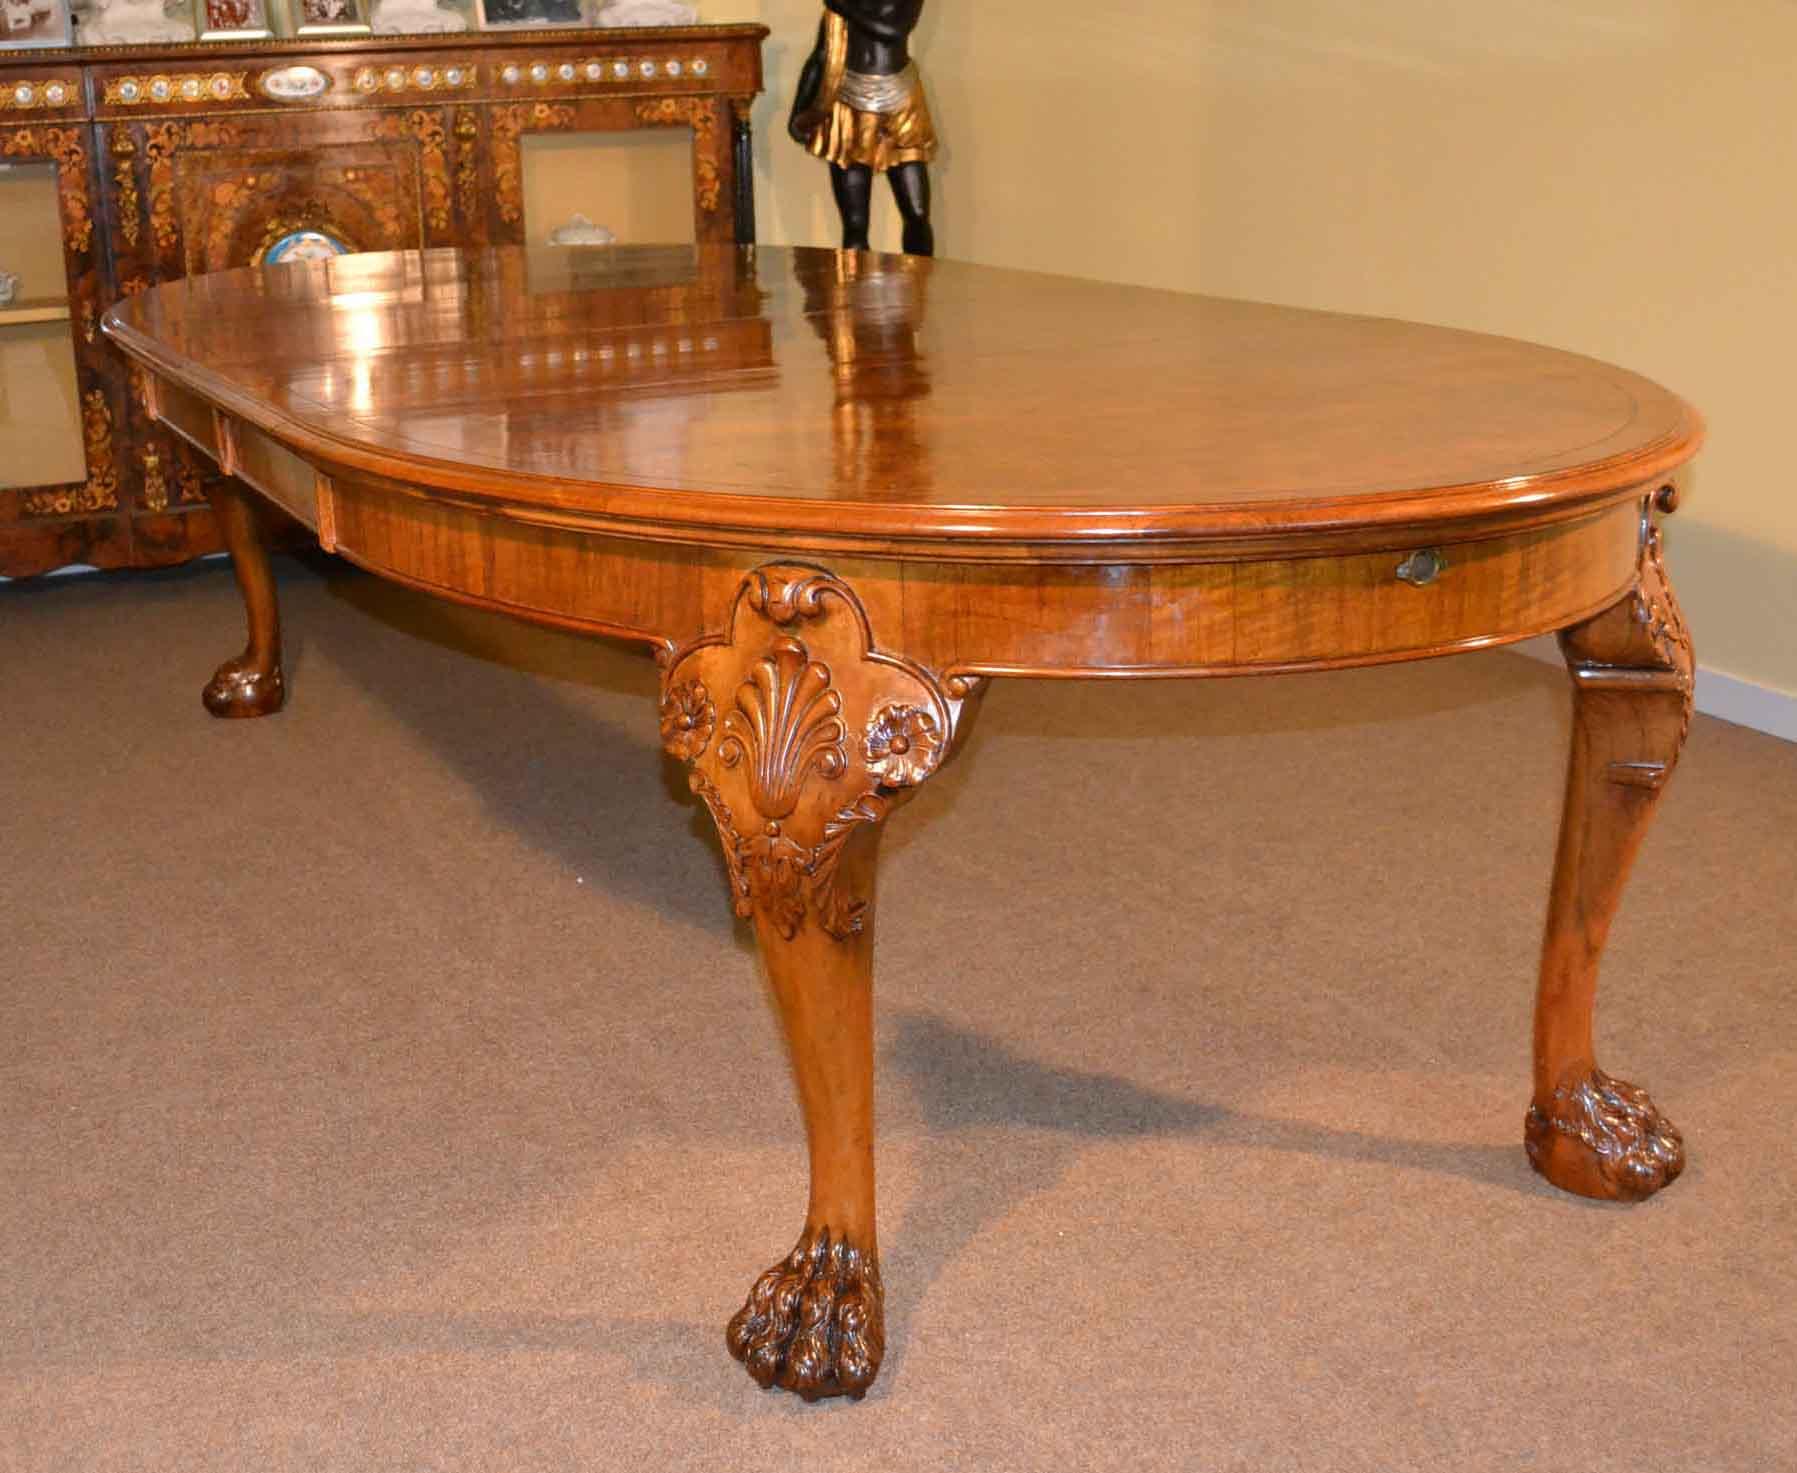 antique bur walnut queen anne style dining table c1920. Black Bedroom Furniture Sets. Home Design Ideas